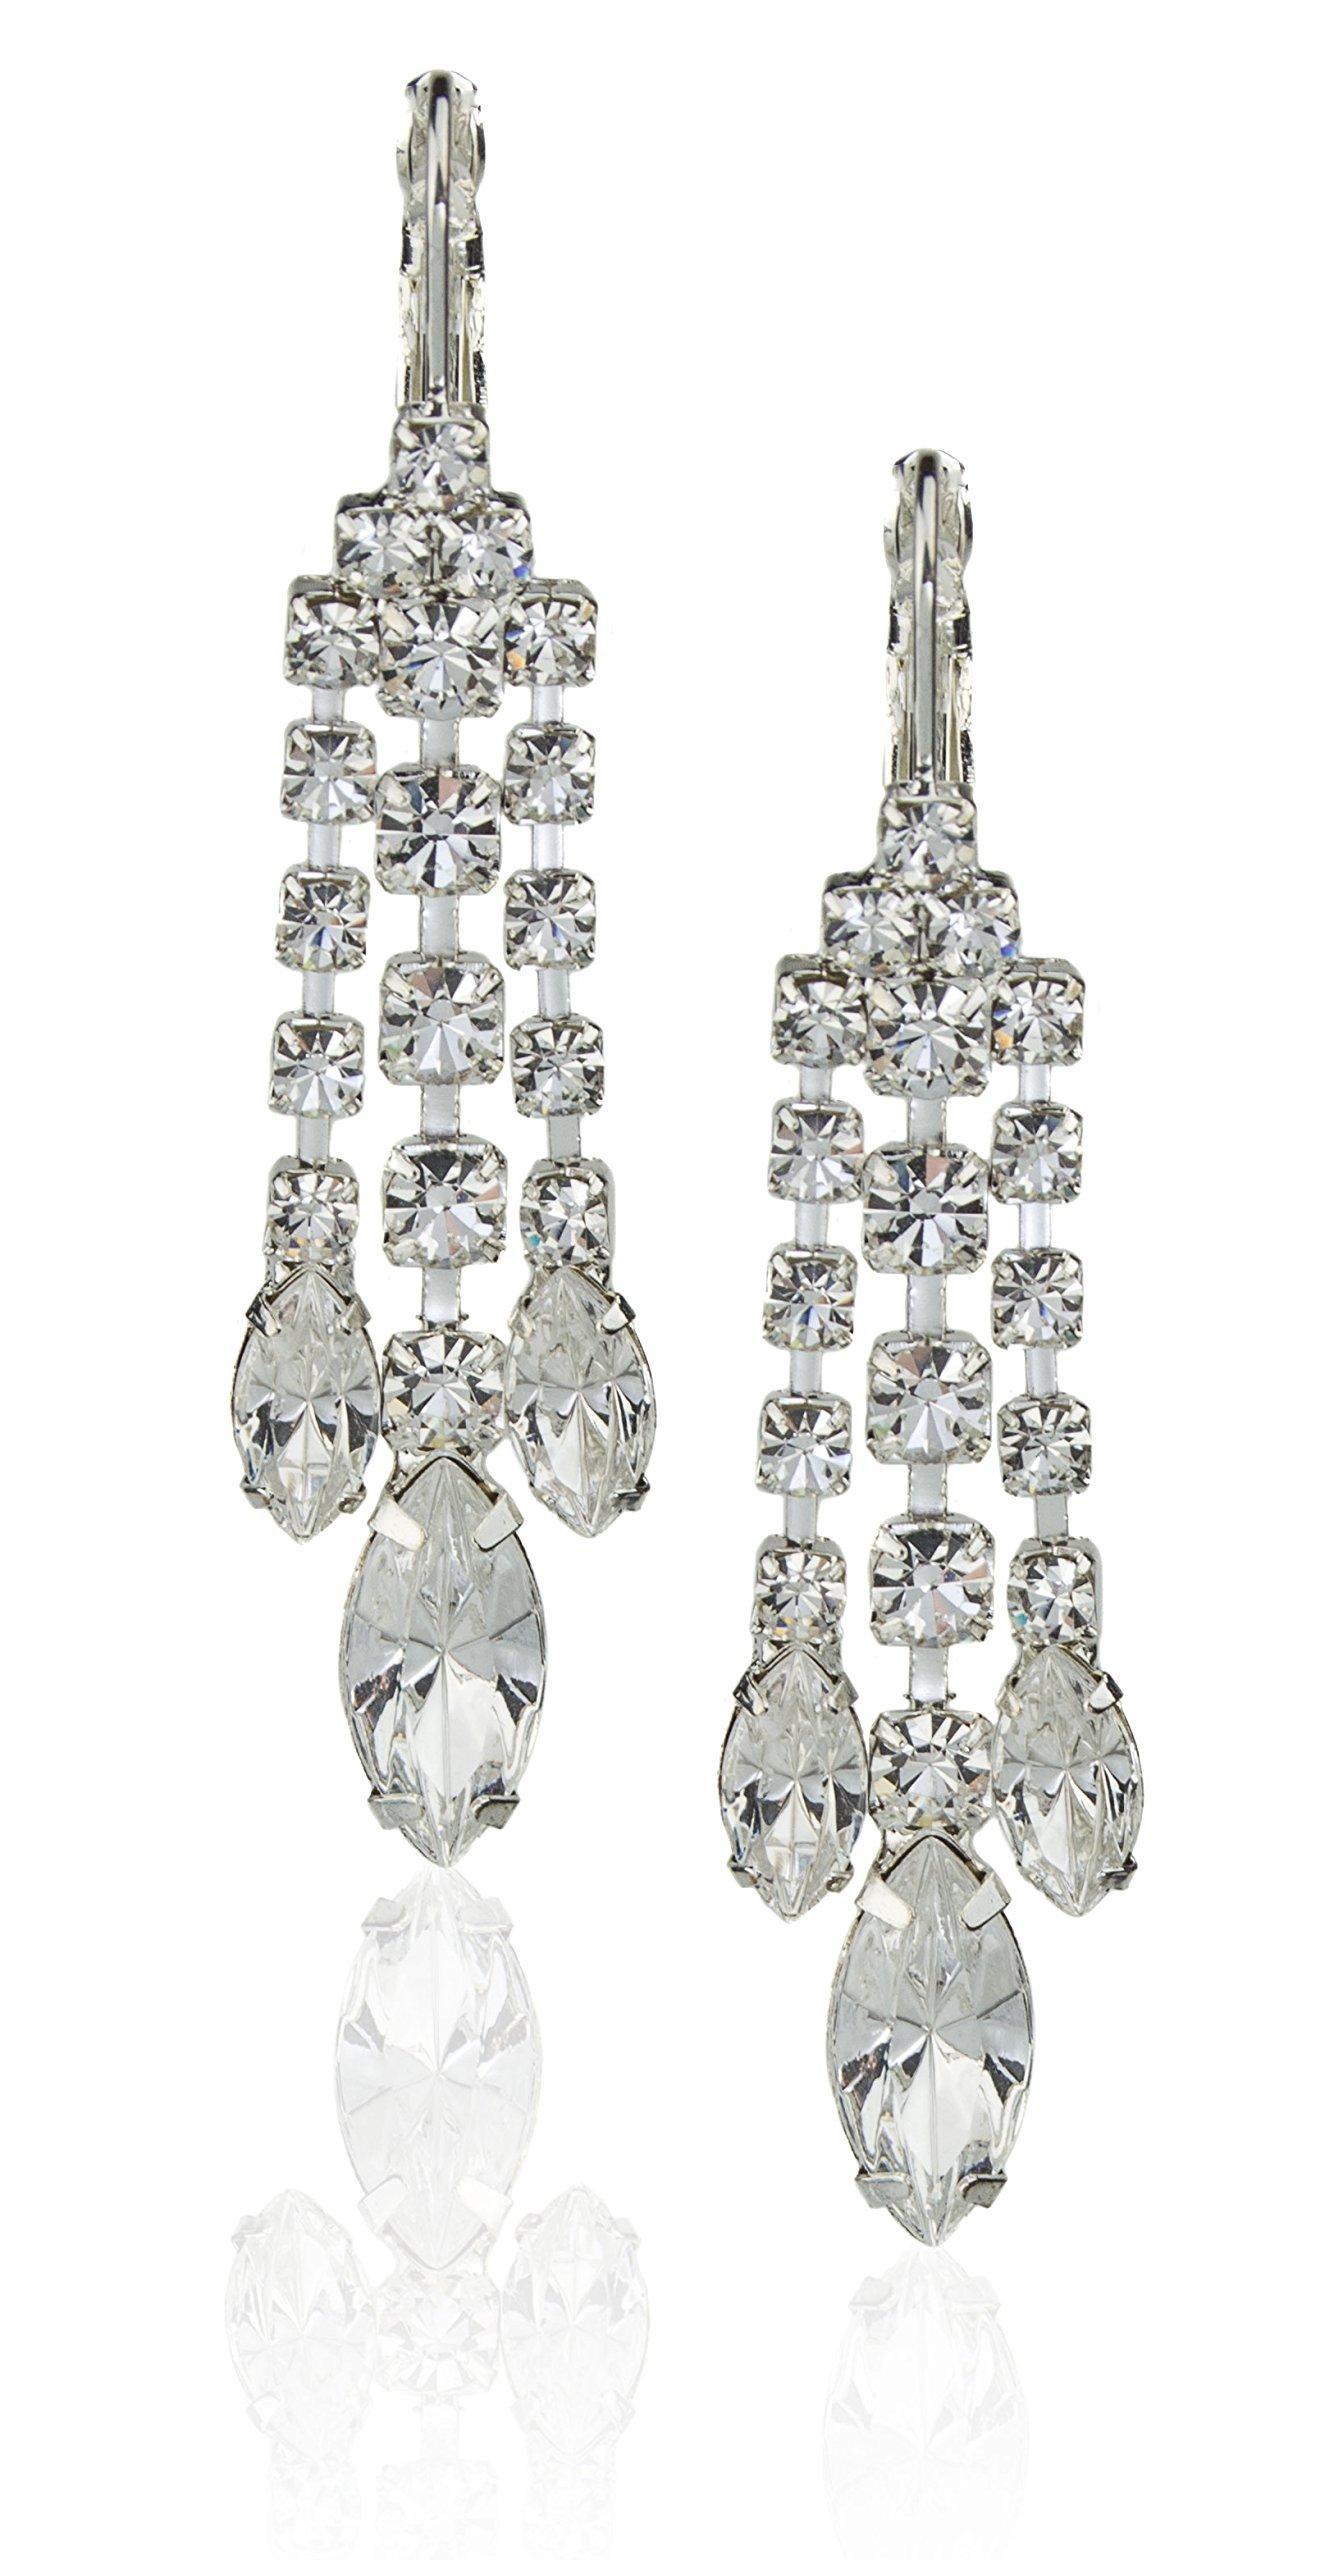 Zoe & Ella Crystal Rhinestone Silver Plated 3 Row Chandelier Earrings with Latch Back